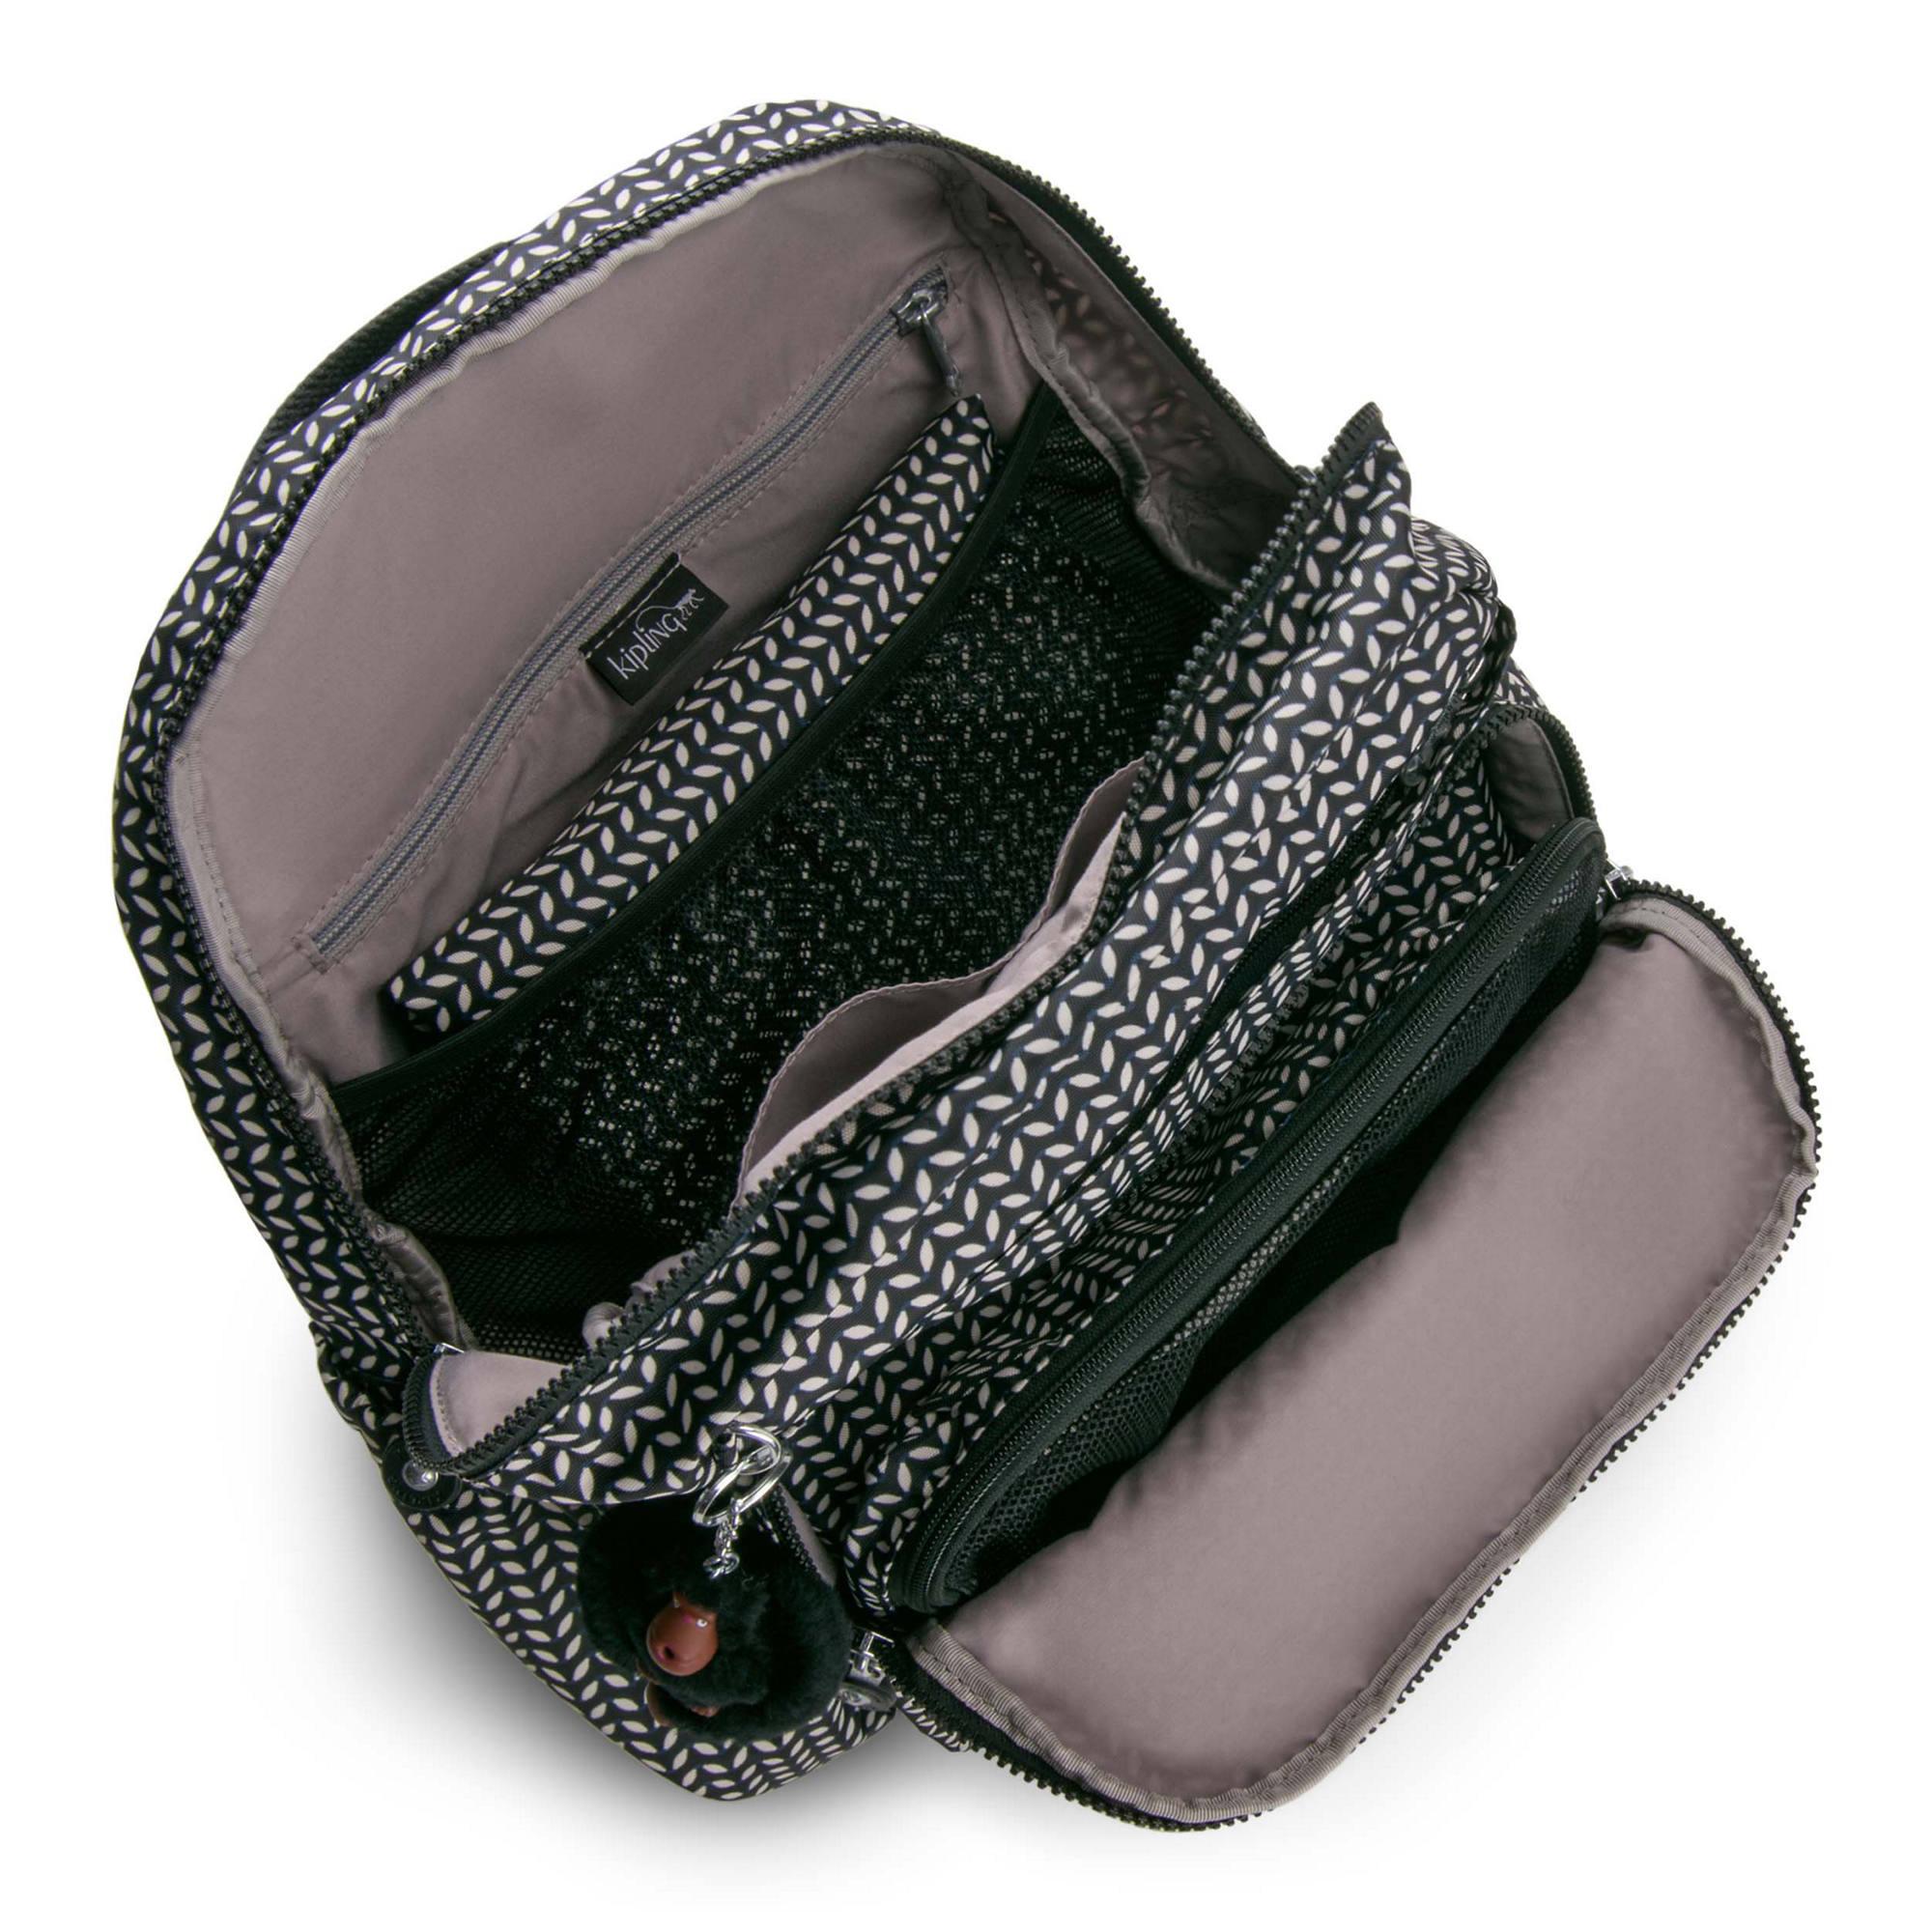 c776d7867e Kipling-Maisie-Metallic-Diaper-Bag-Backpack thumbnail 12